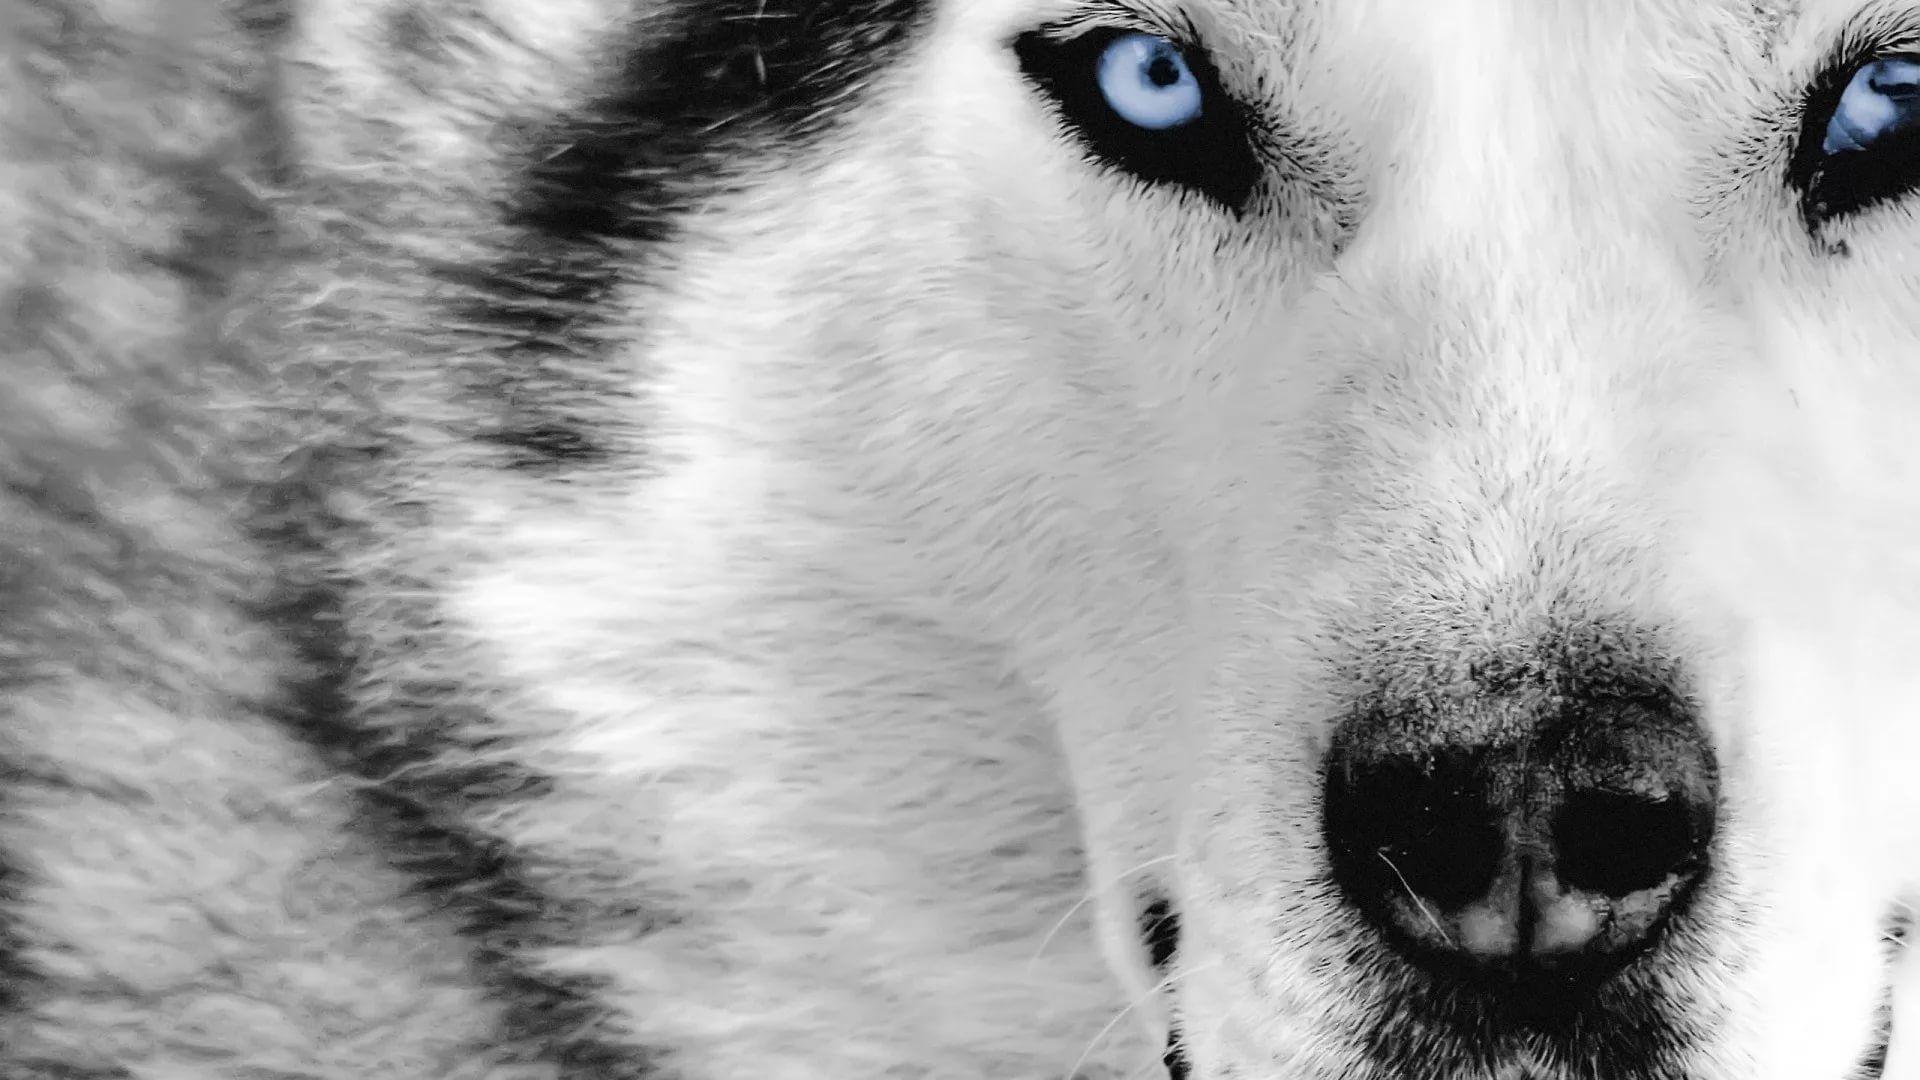 Cool Wolf wallpaper photo full hd